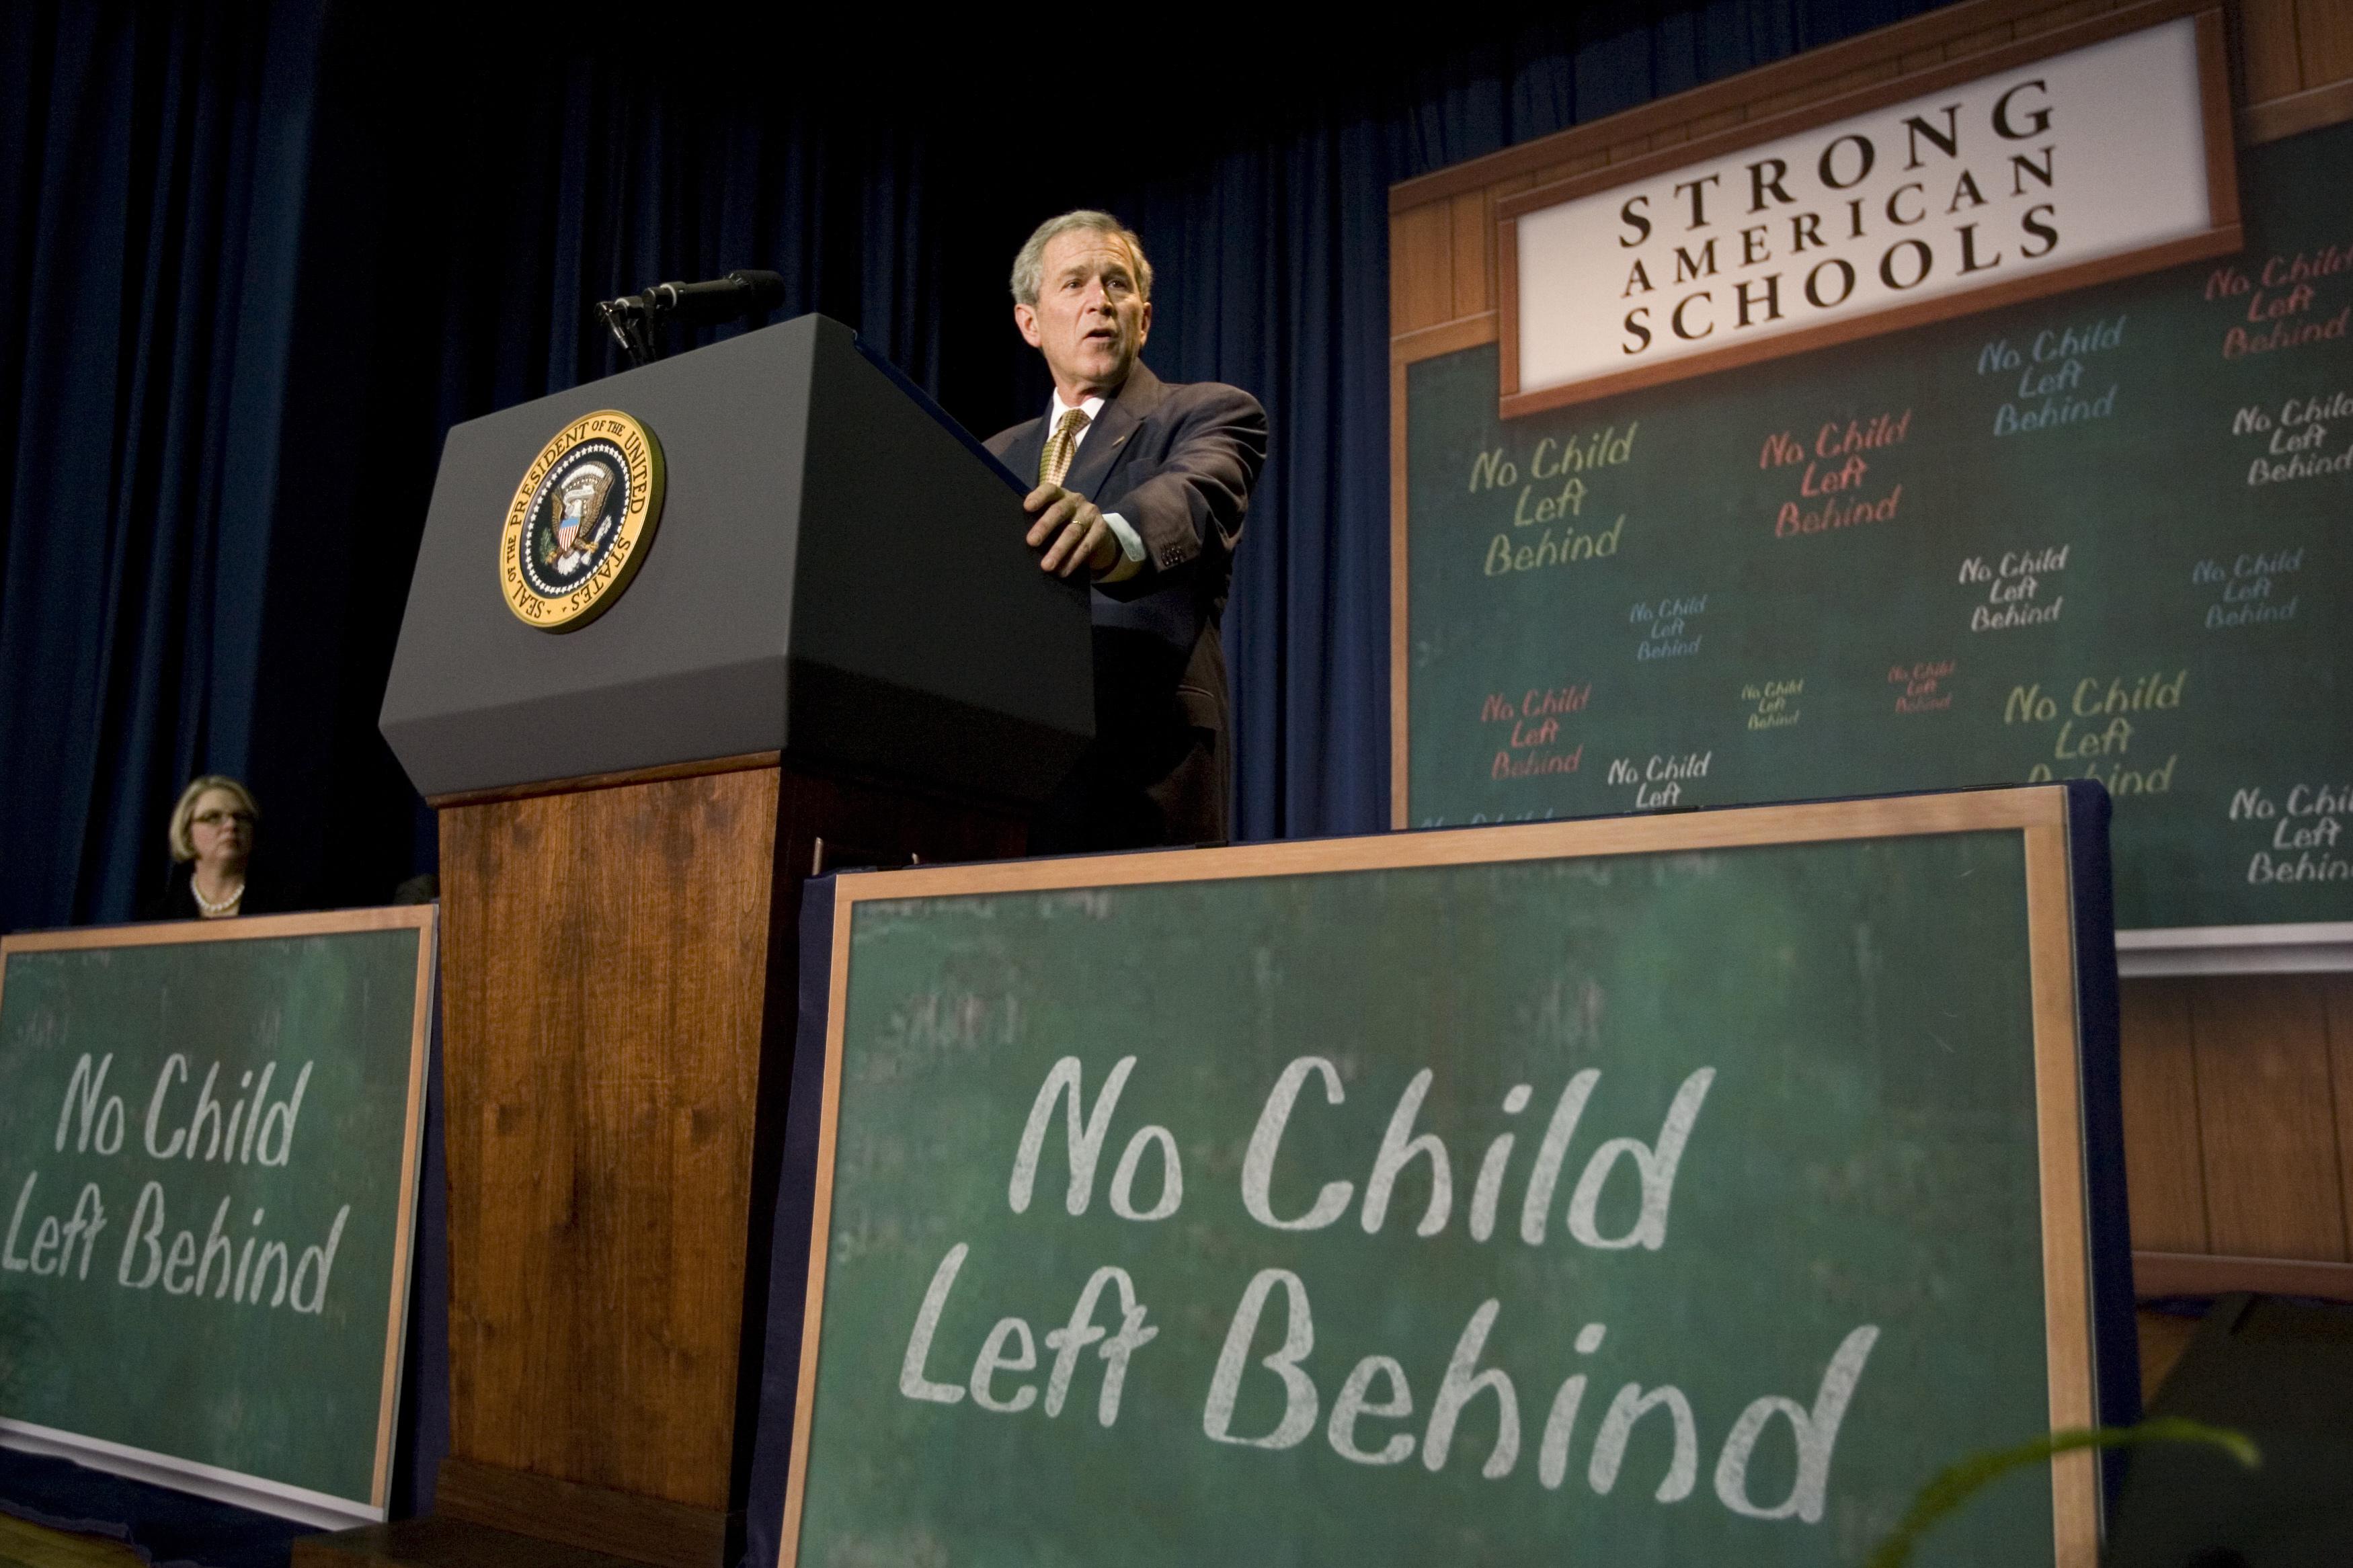 Goodbye, No Child Left Behind